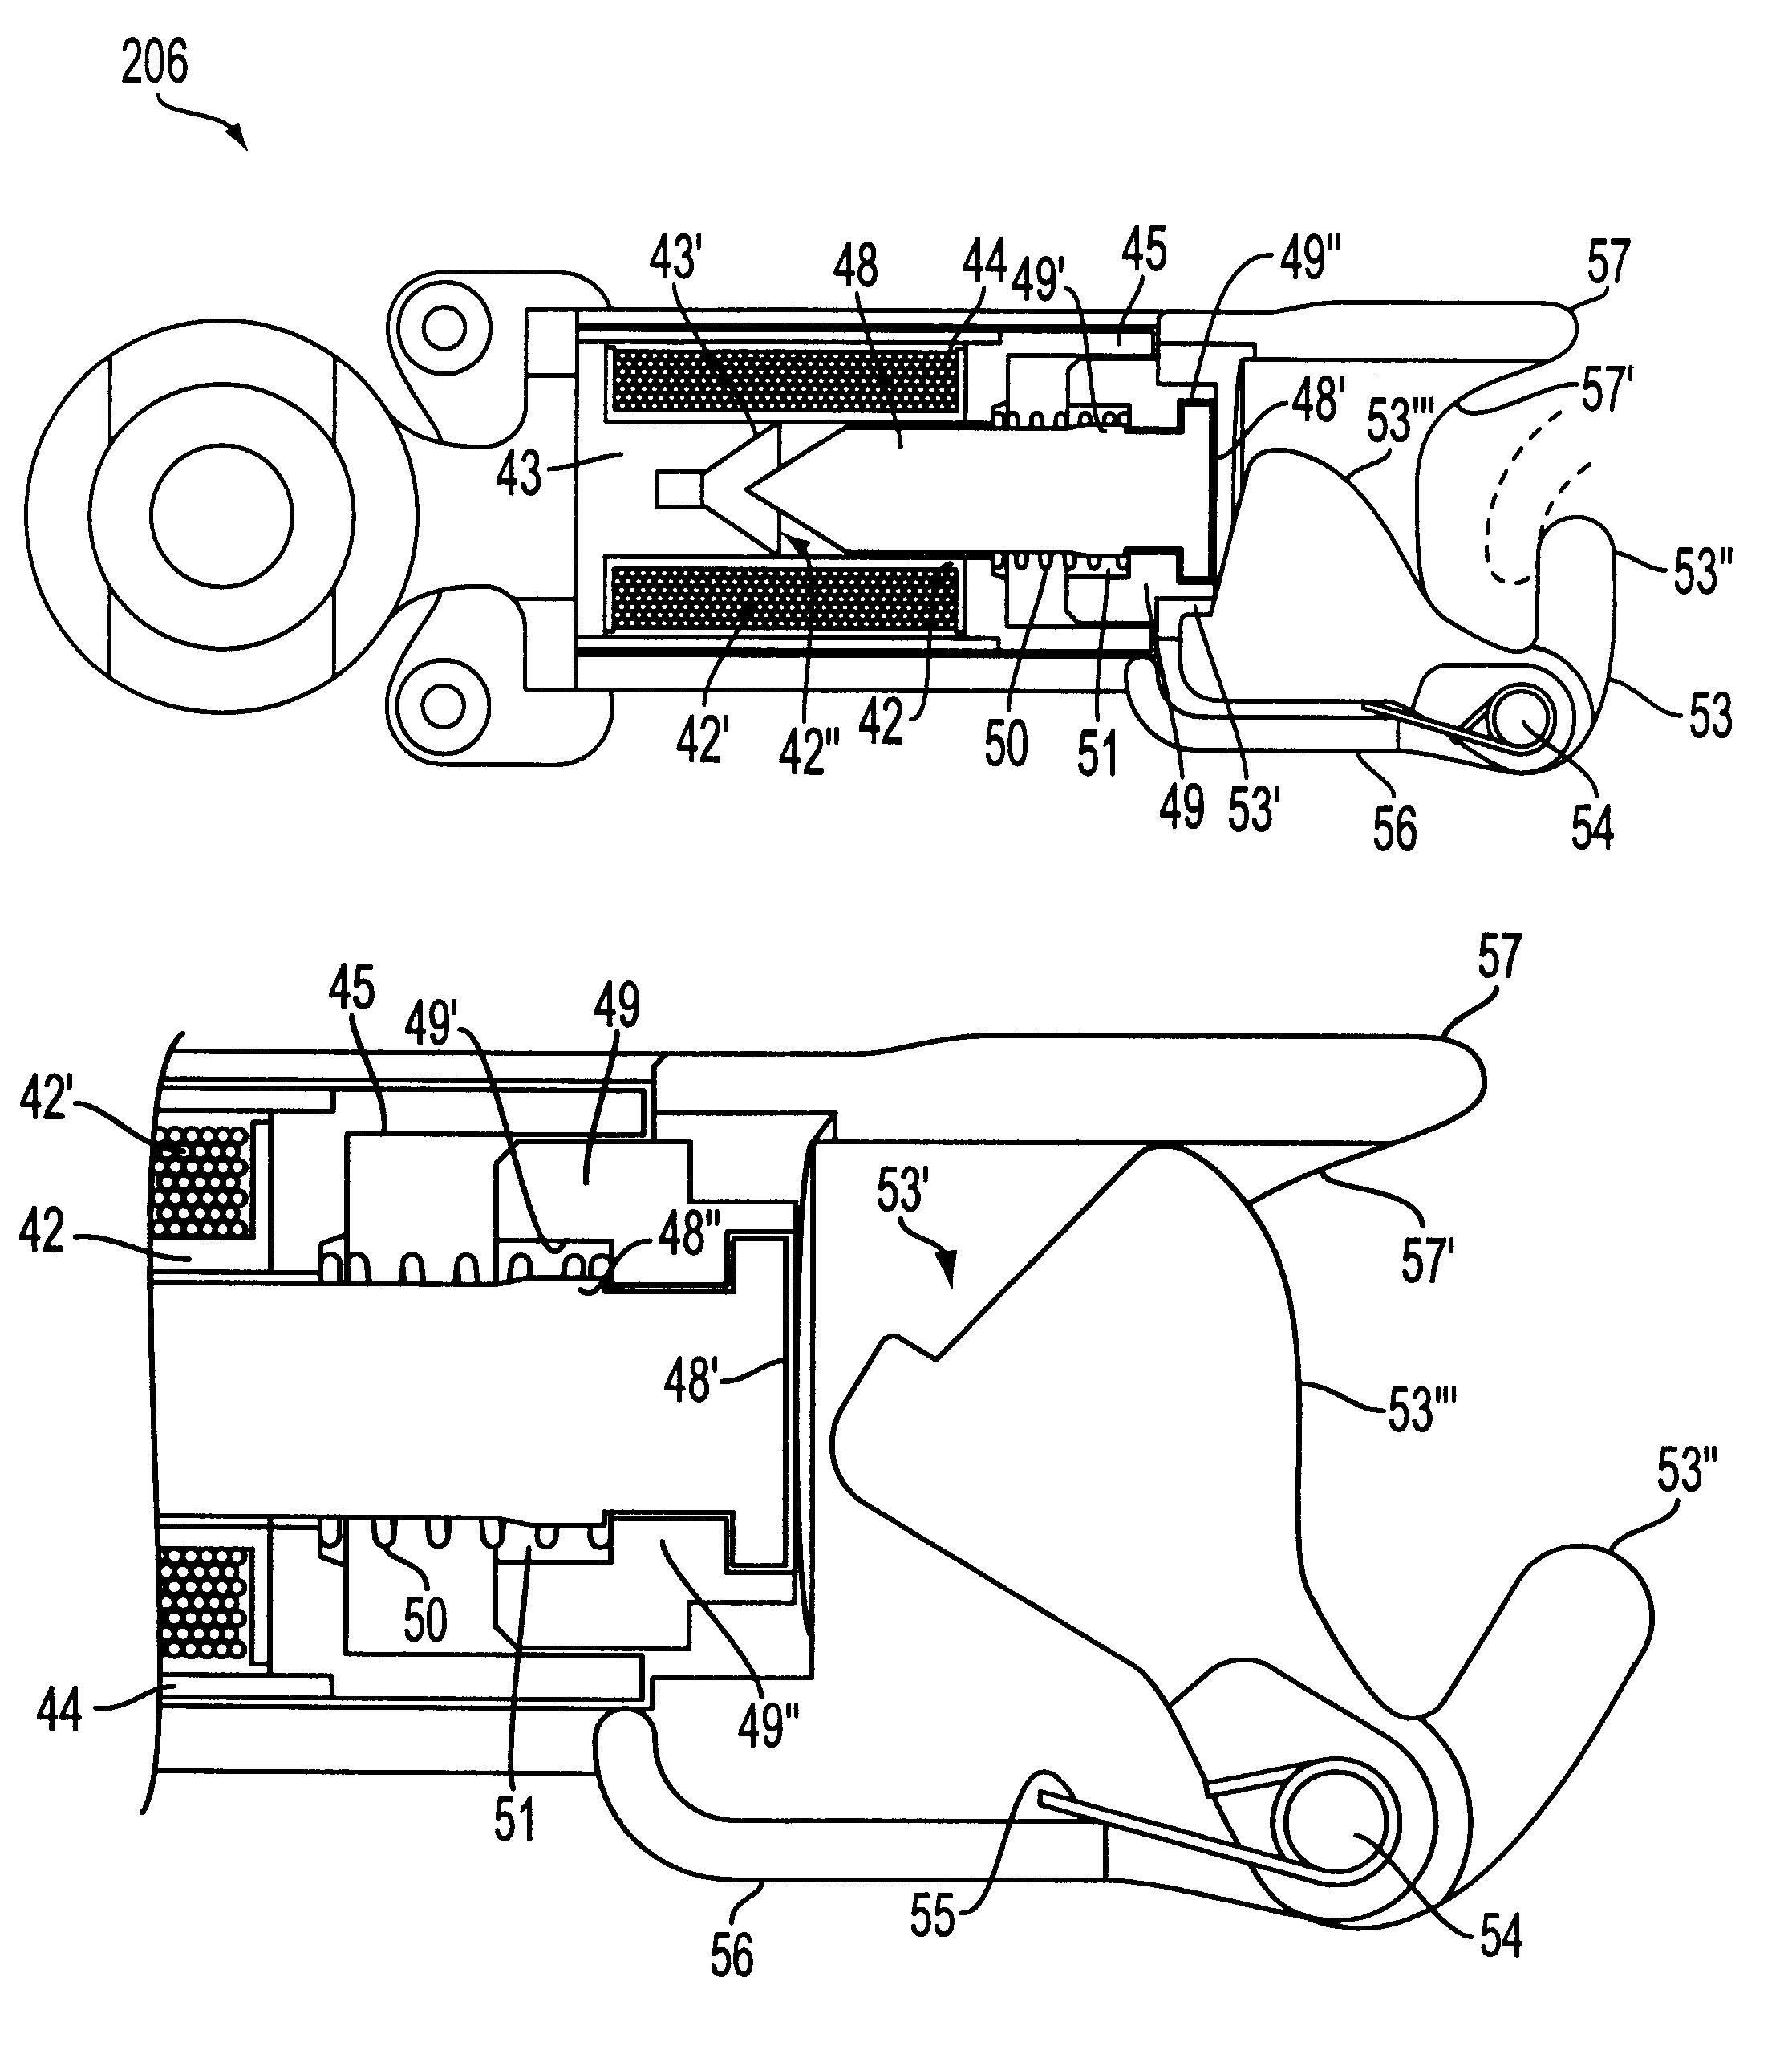 ddec 5 ecm wiring diagram free picture ddec v cat 3126 ecm wiring diagram